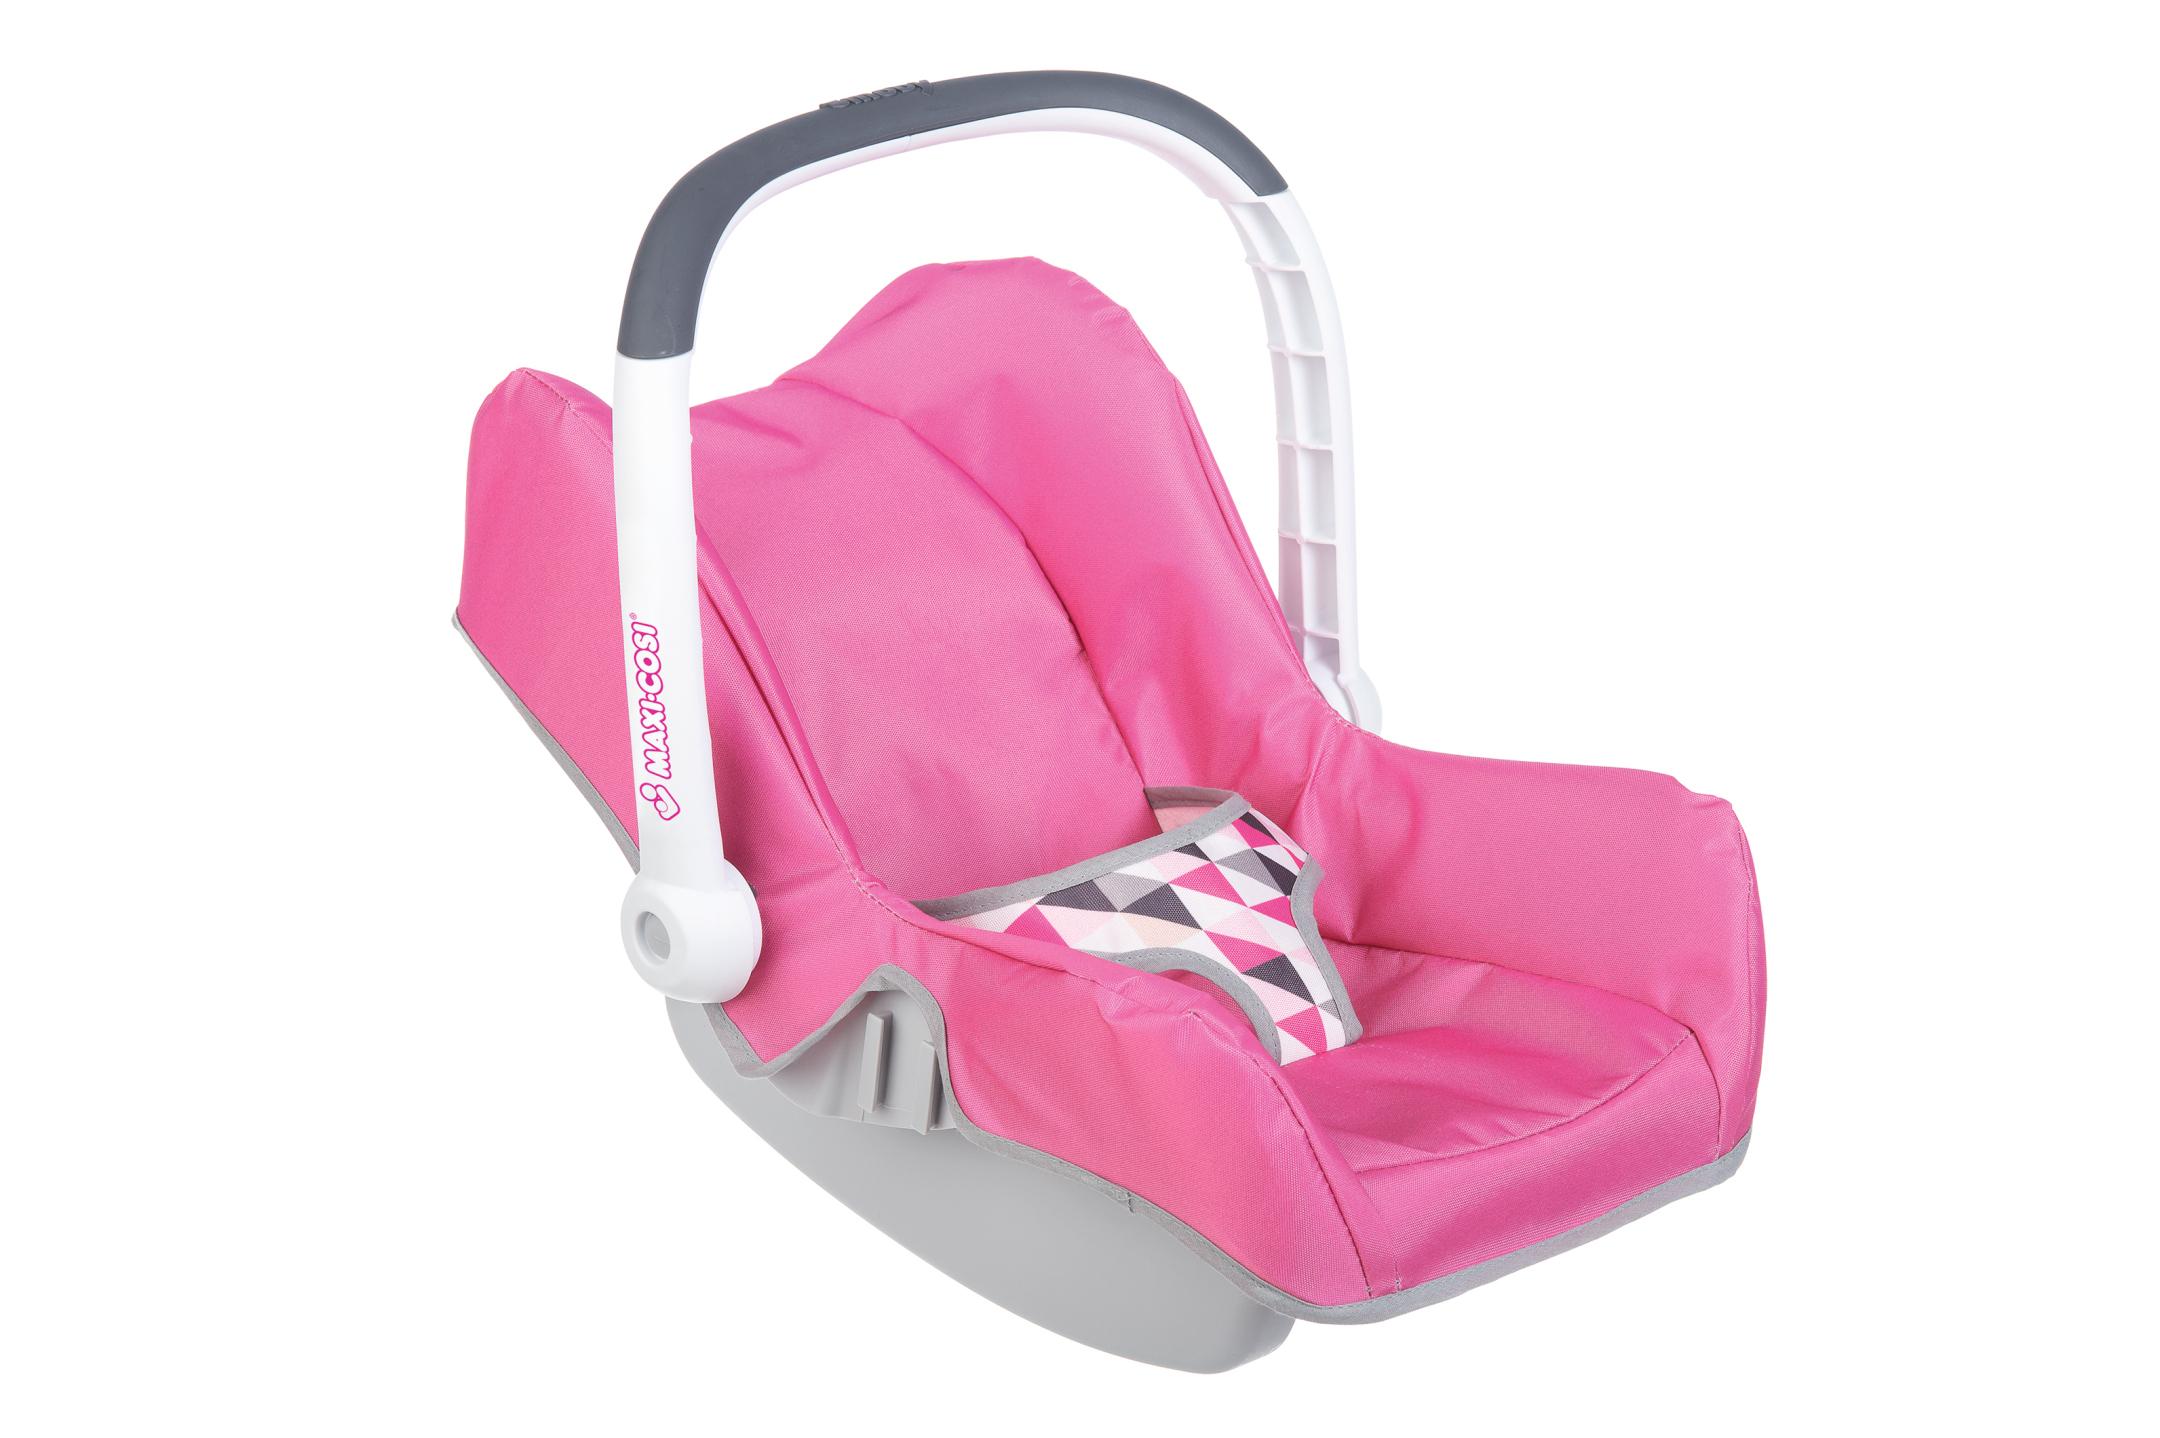 Maxi-Cosi Autositz pink/grau